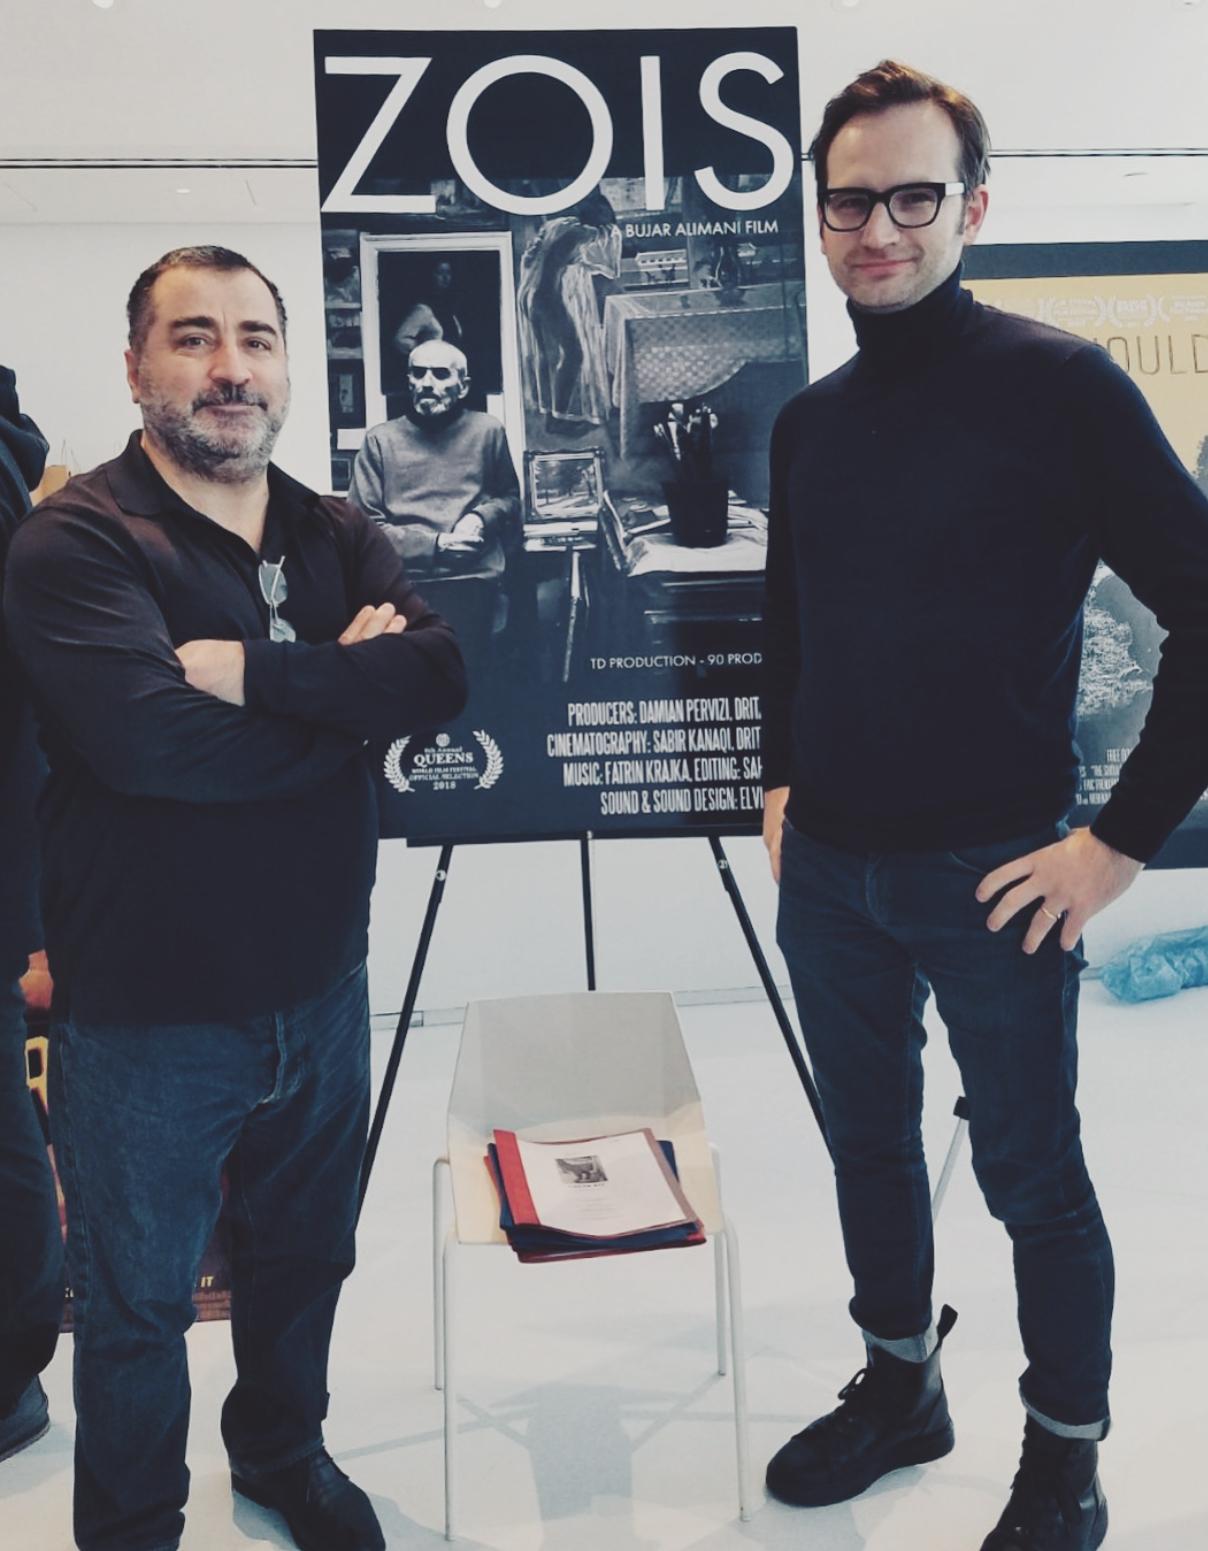 With Director Bujar Alimani @ QWFF